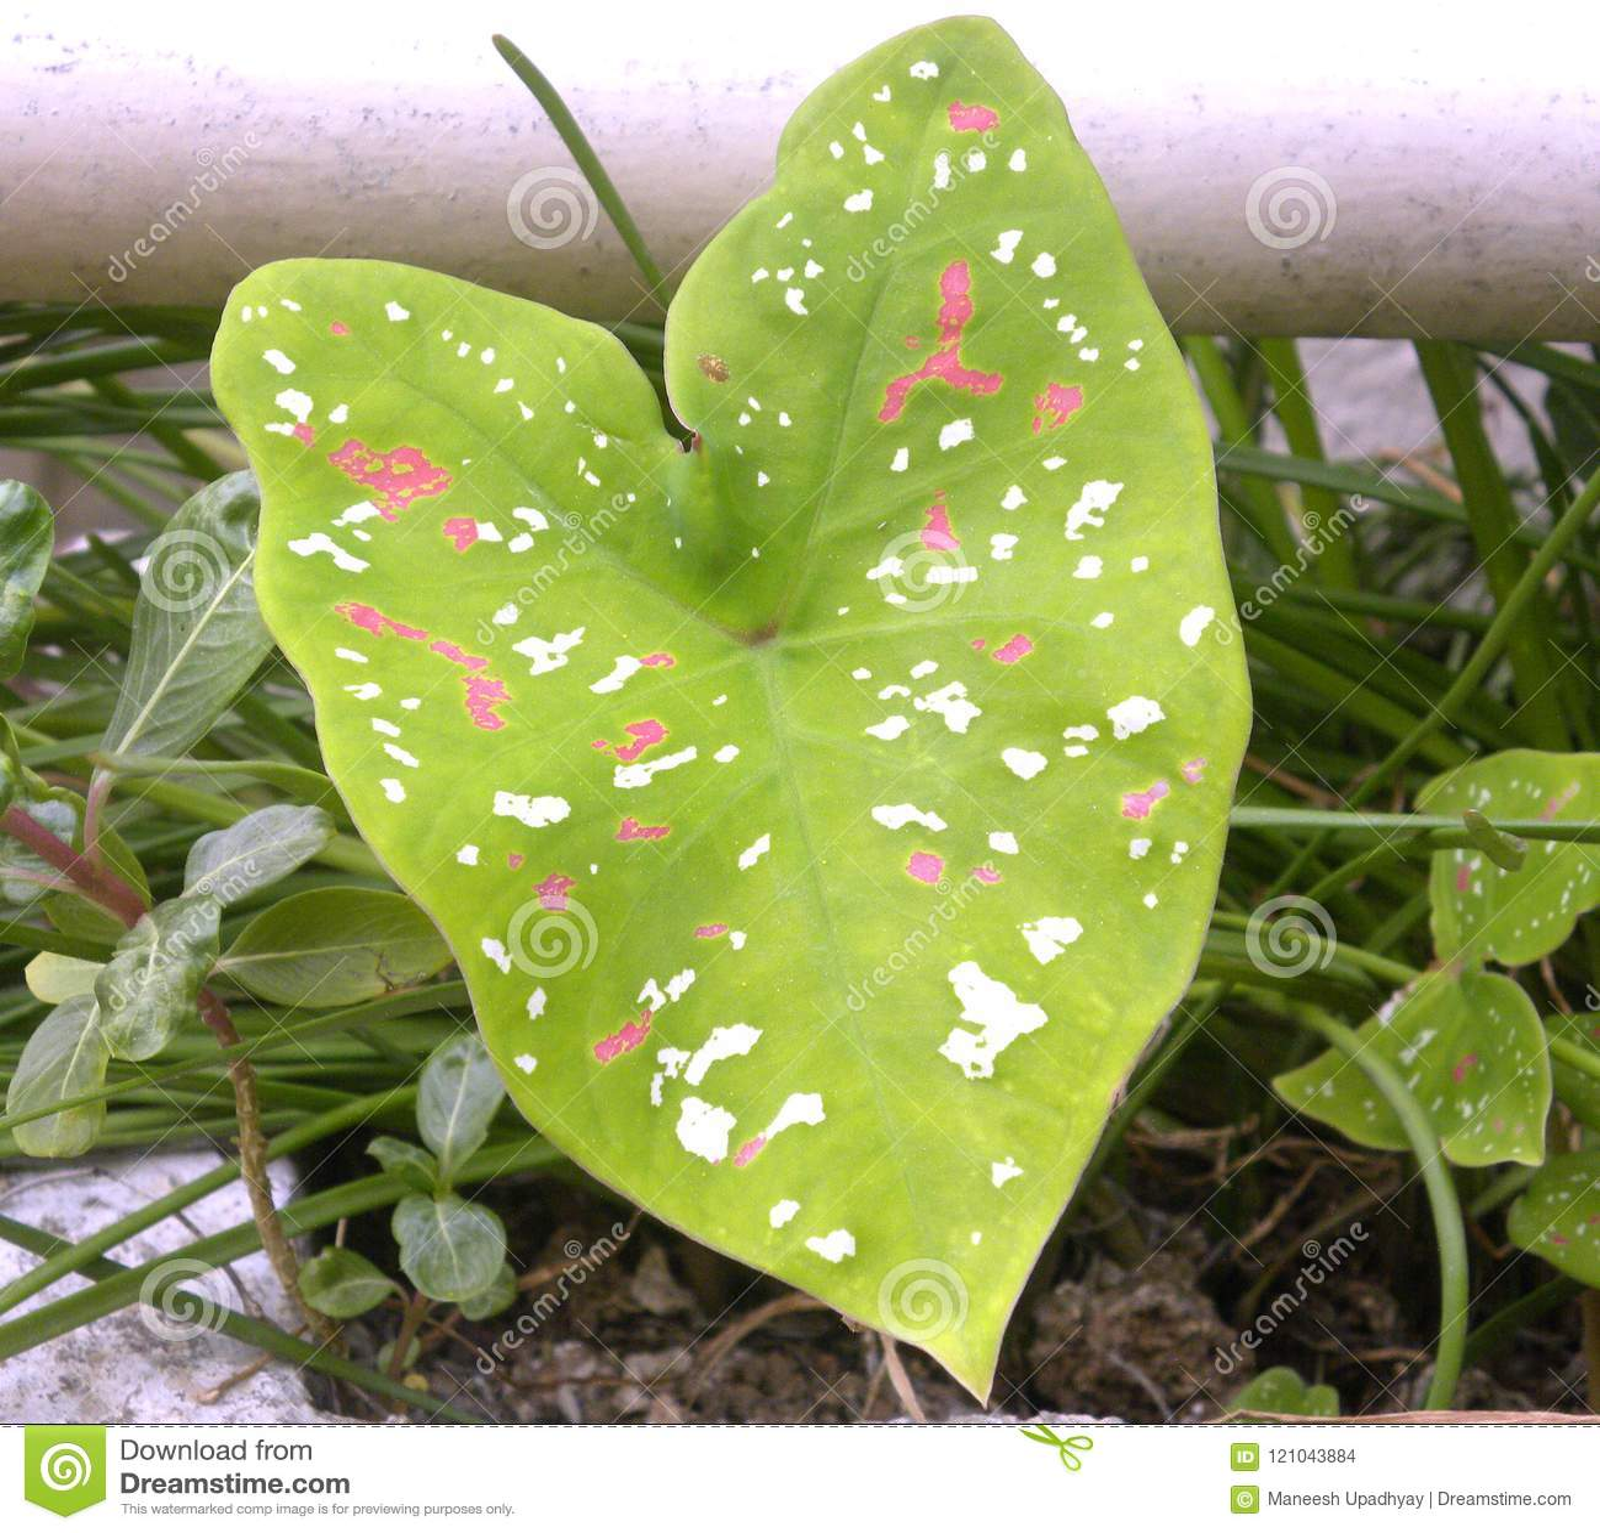 Light Green Color Leaf Of Caladium Tricolor Plant Stock Photo ...